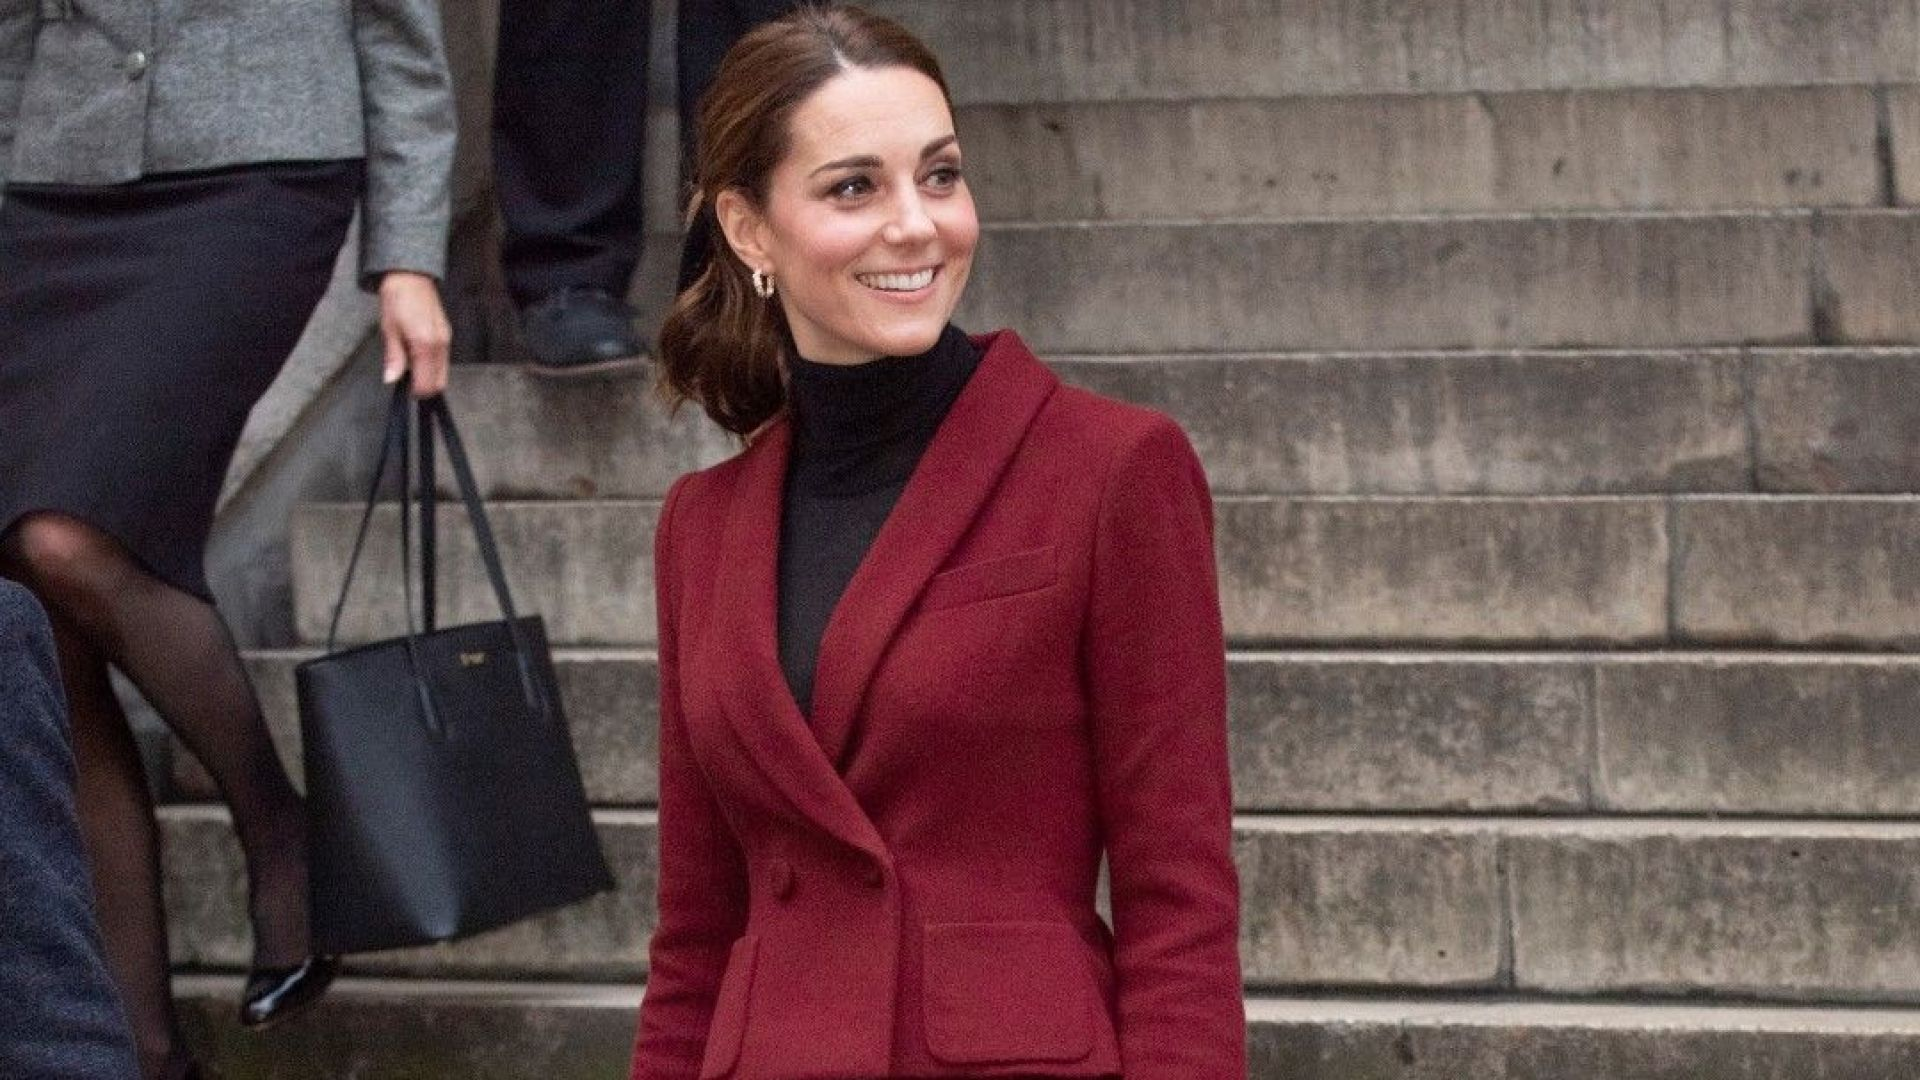 И Кейт избра бургундско червено